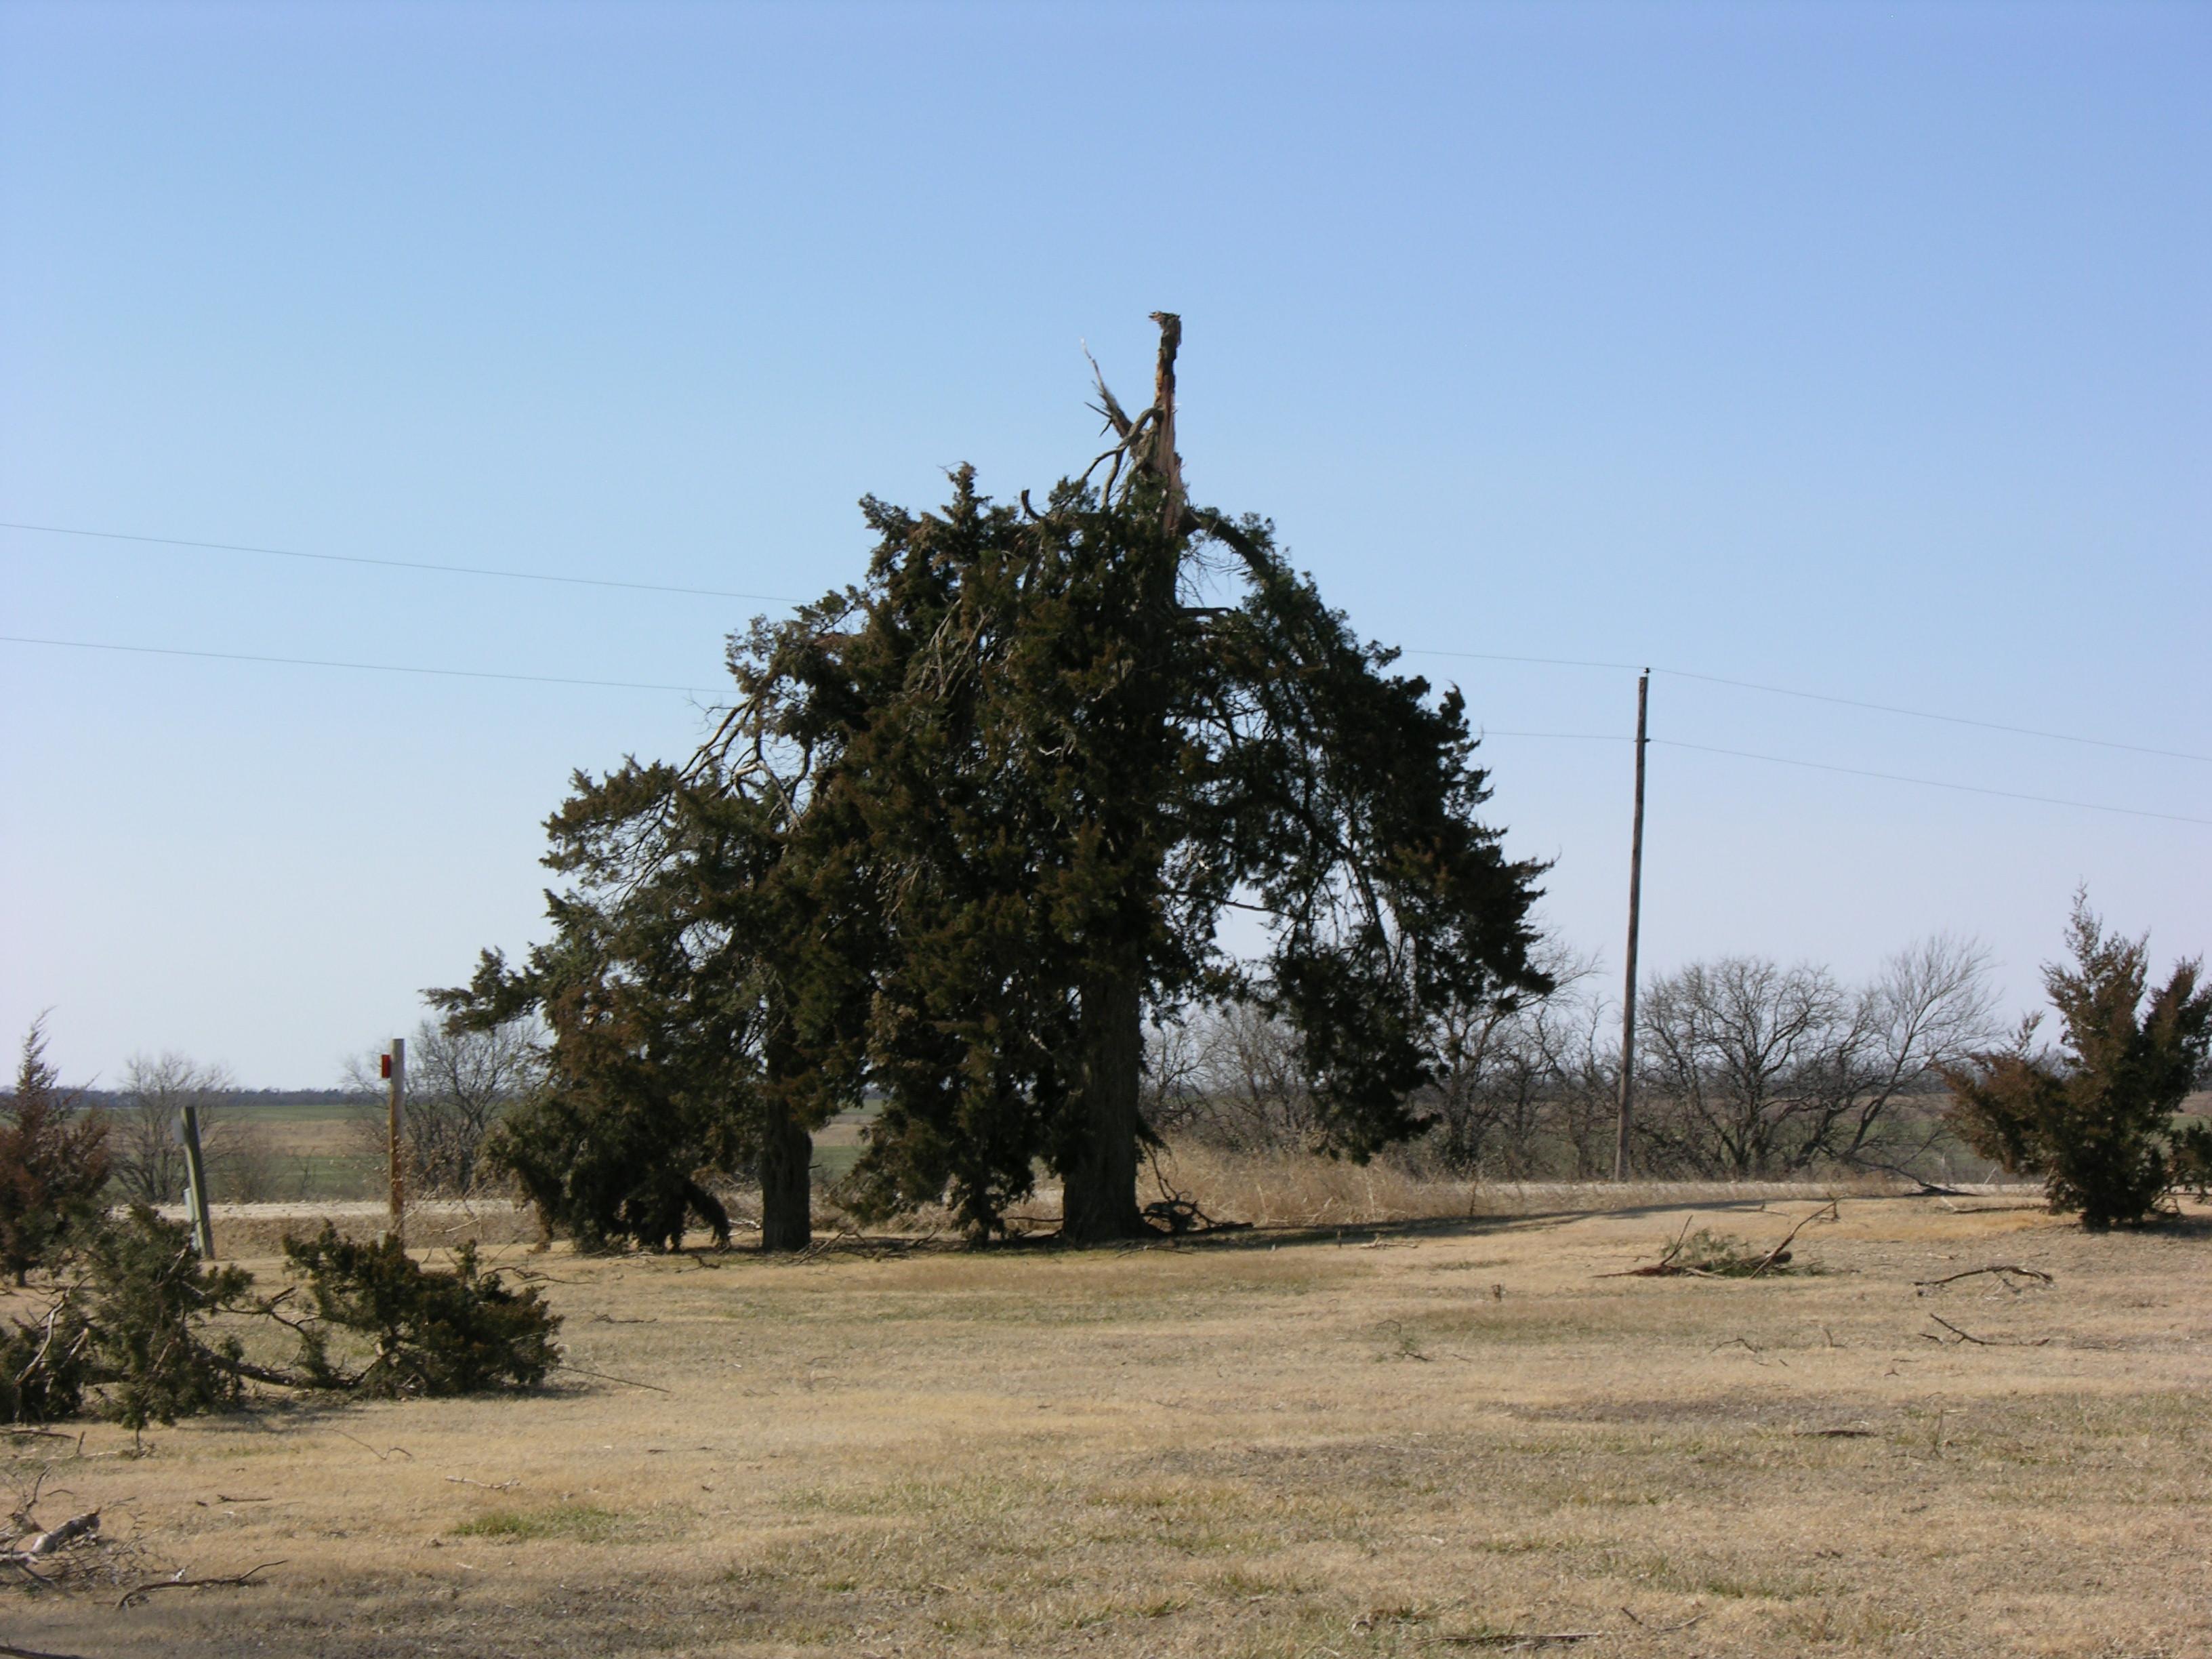 Kansas jewell county randall -  Tree Split From Tornado Near Randall Kansas Jewell County On February 28 2012